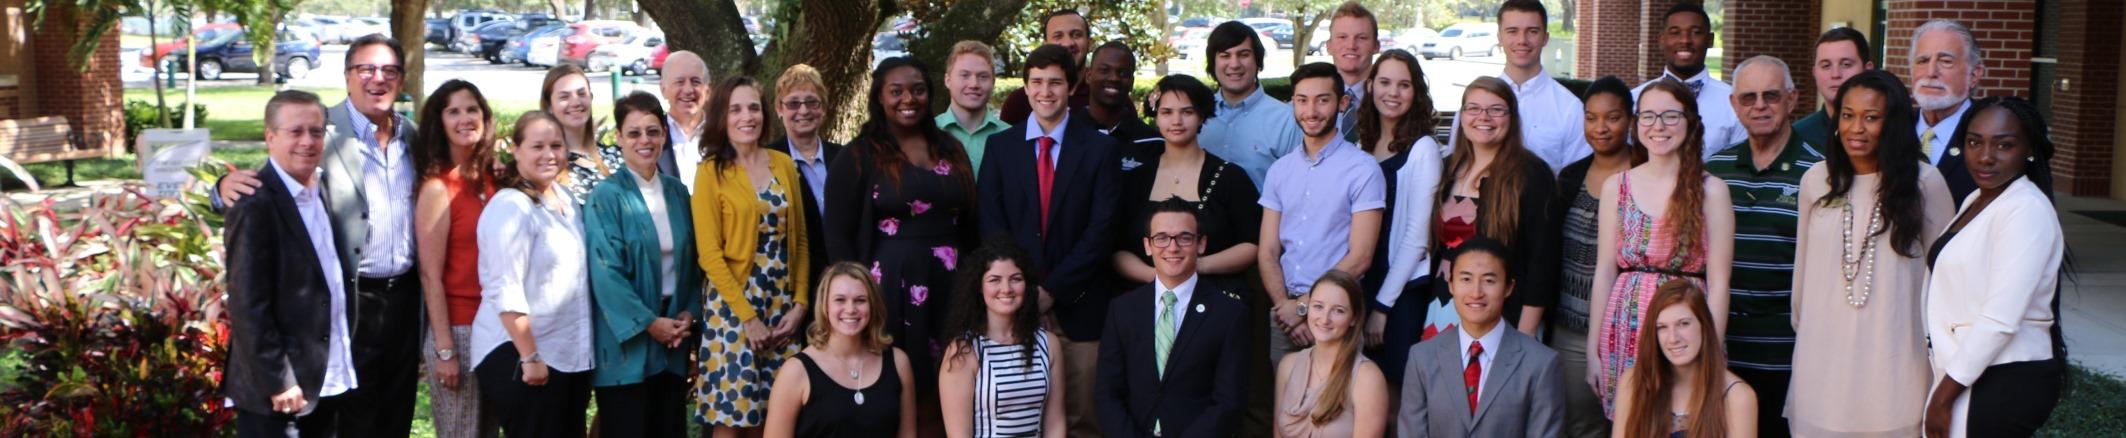 usf alumni scholarships